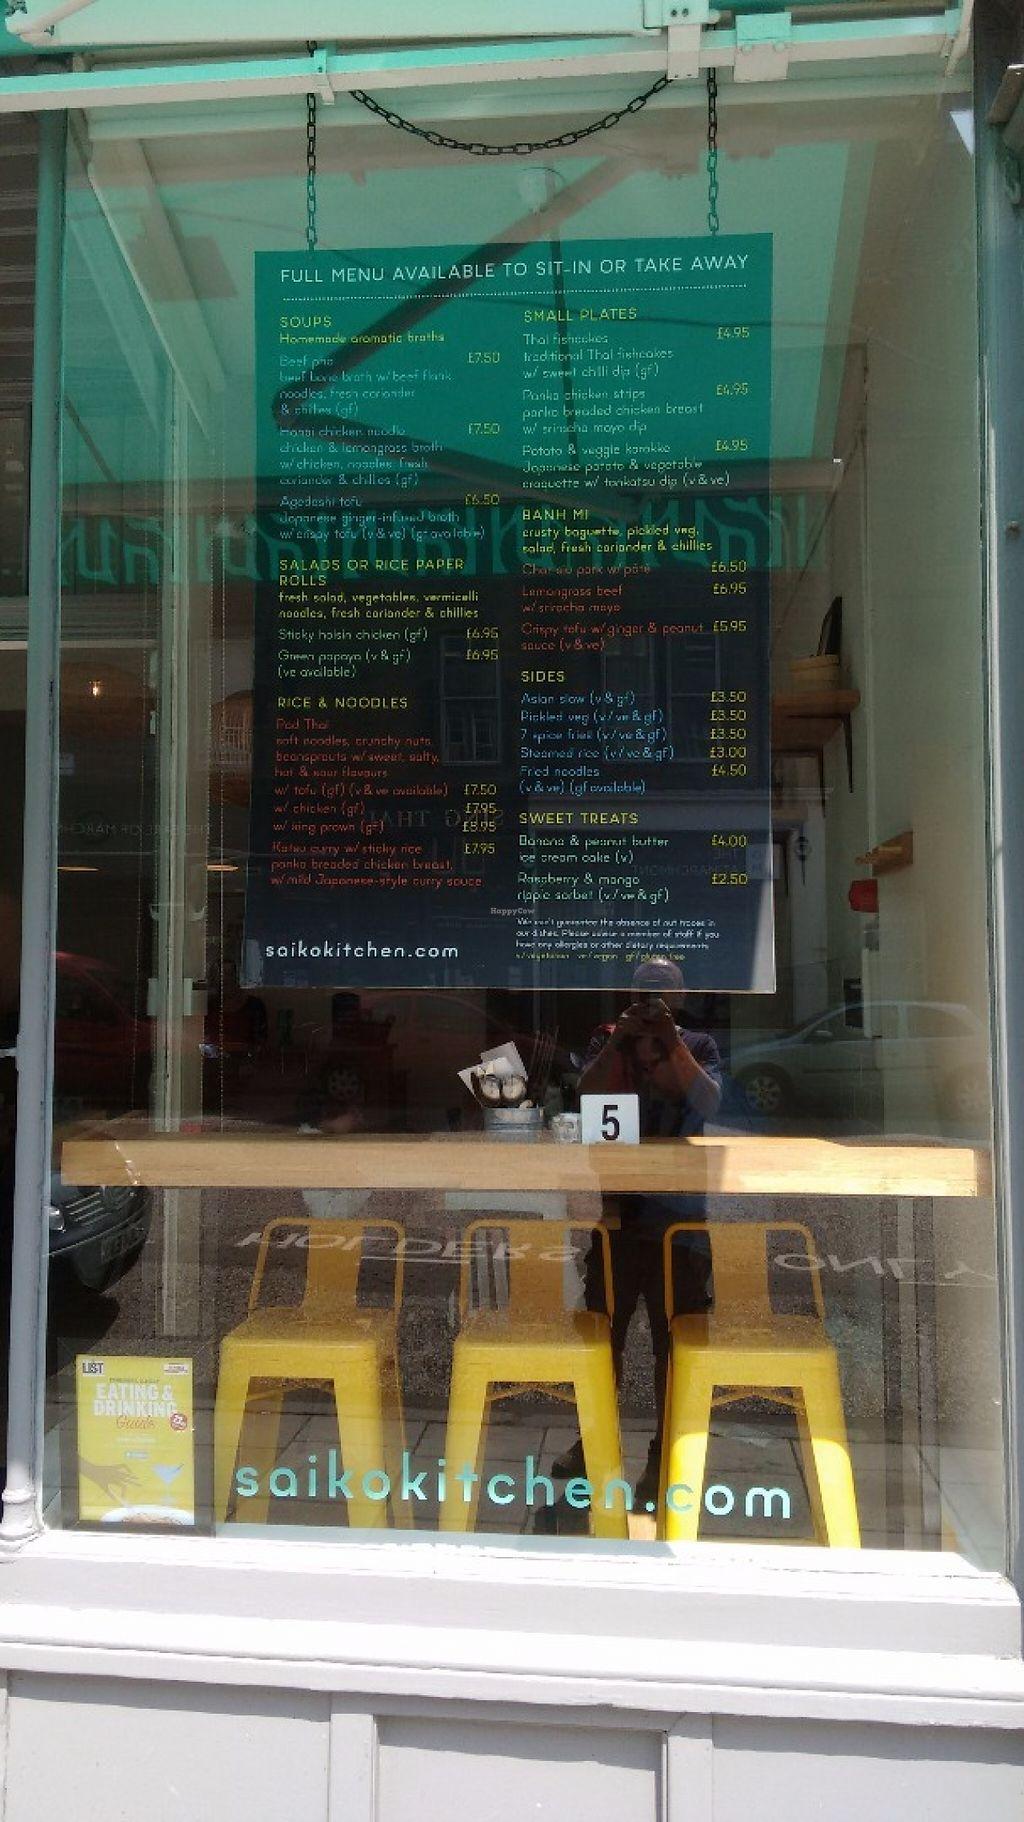 "Photo of Saiko Kitchen  by <a href=""/members/profile/craigmc"">craigmc</a> <br/>Menu <br/> June 8, 2016  - <a href='/contact/abuse/image/74509/152977'>Report</a>"